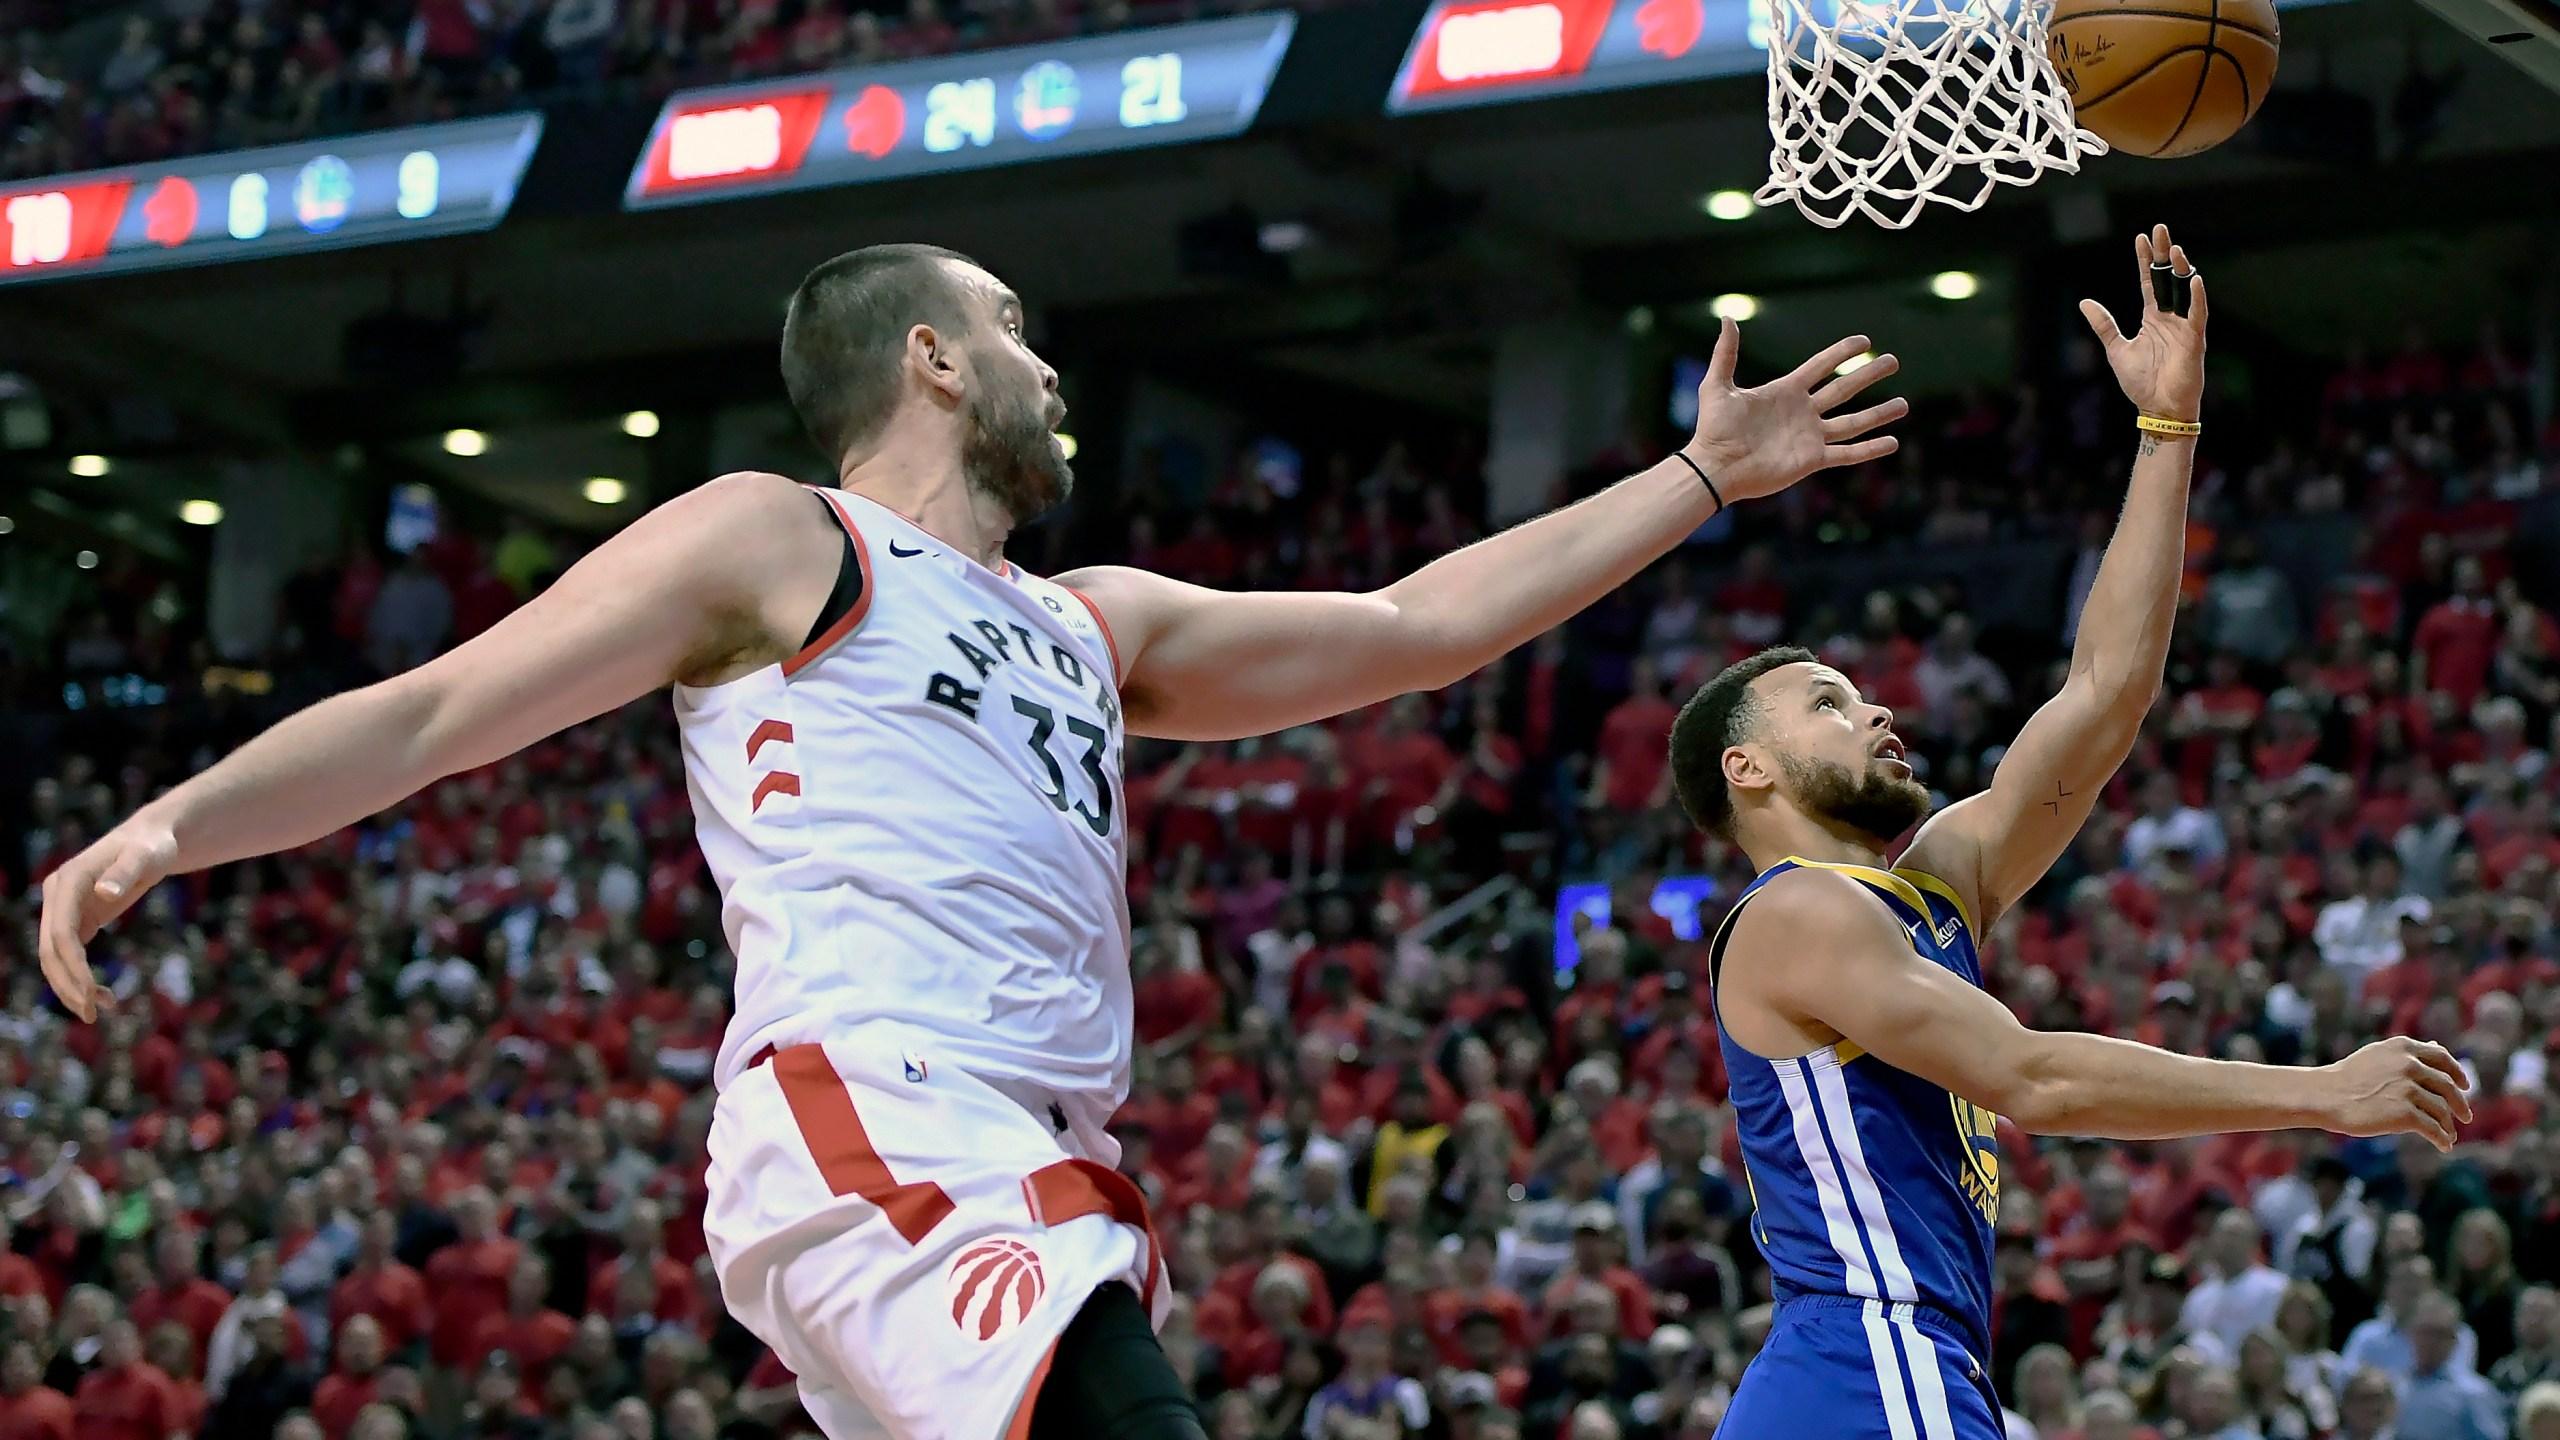 NBA_Finals_Warriors_Raptors_Basketball_72085-159532.jpg10877908